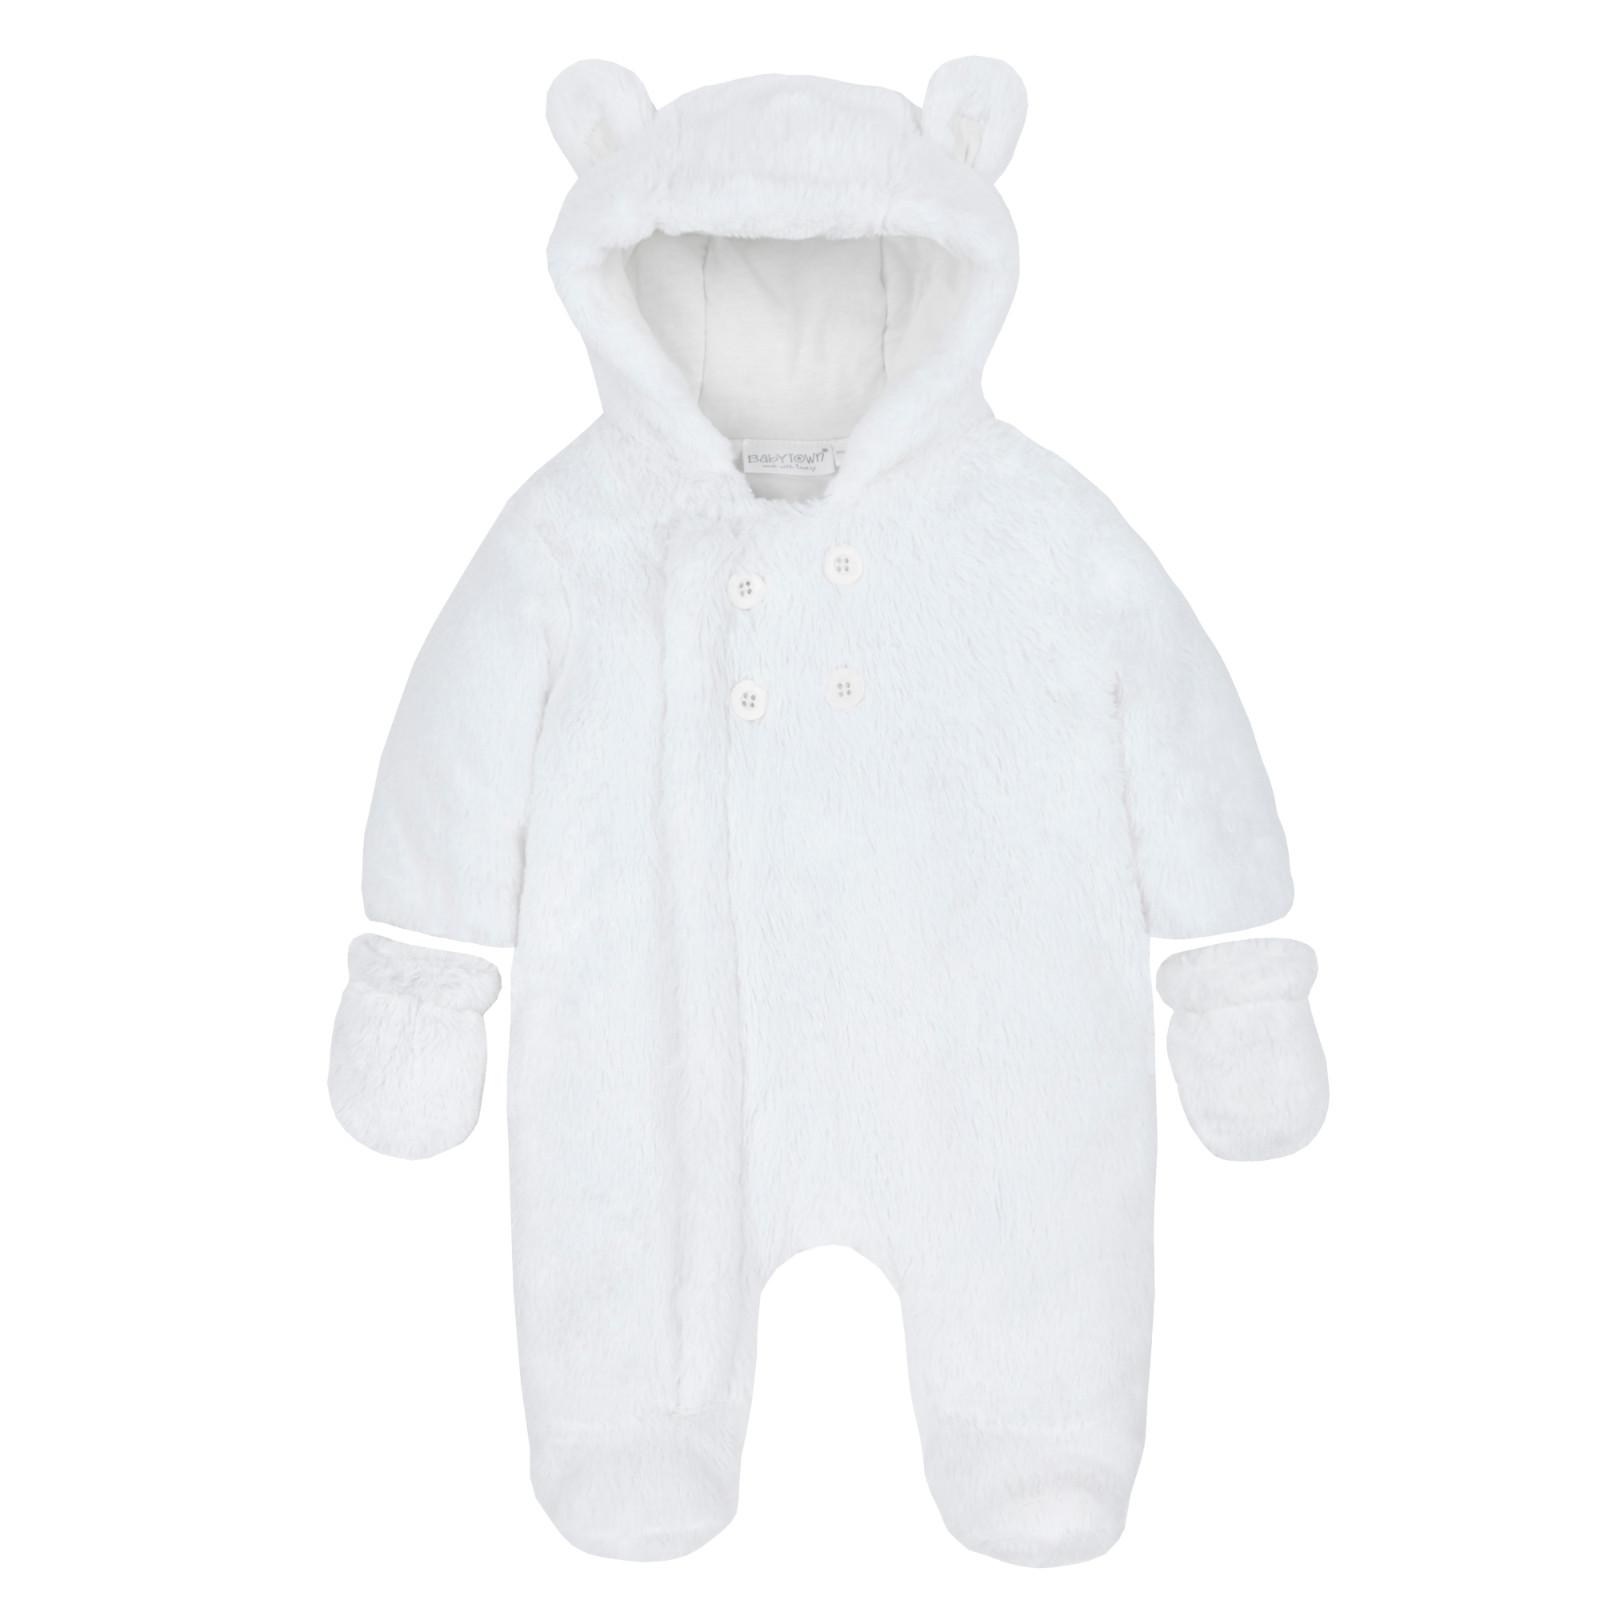 6bfff56c0 Baby Boys Girls Hooded Snowsuit Soft Faux Fur Fleece Pramsuit Warm ...